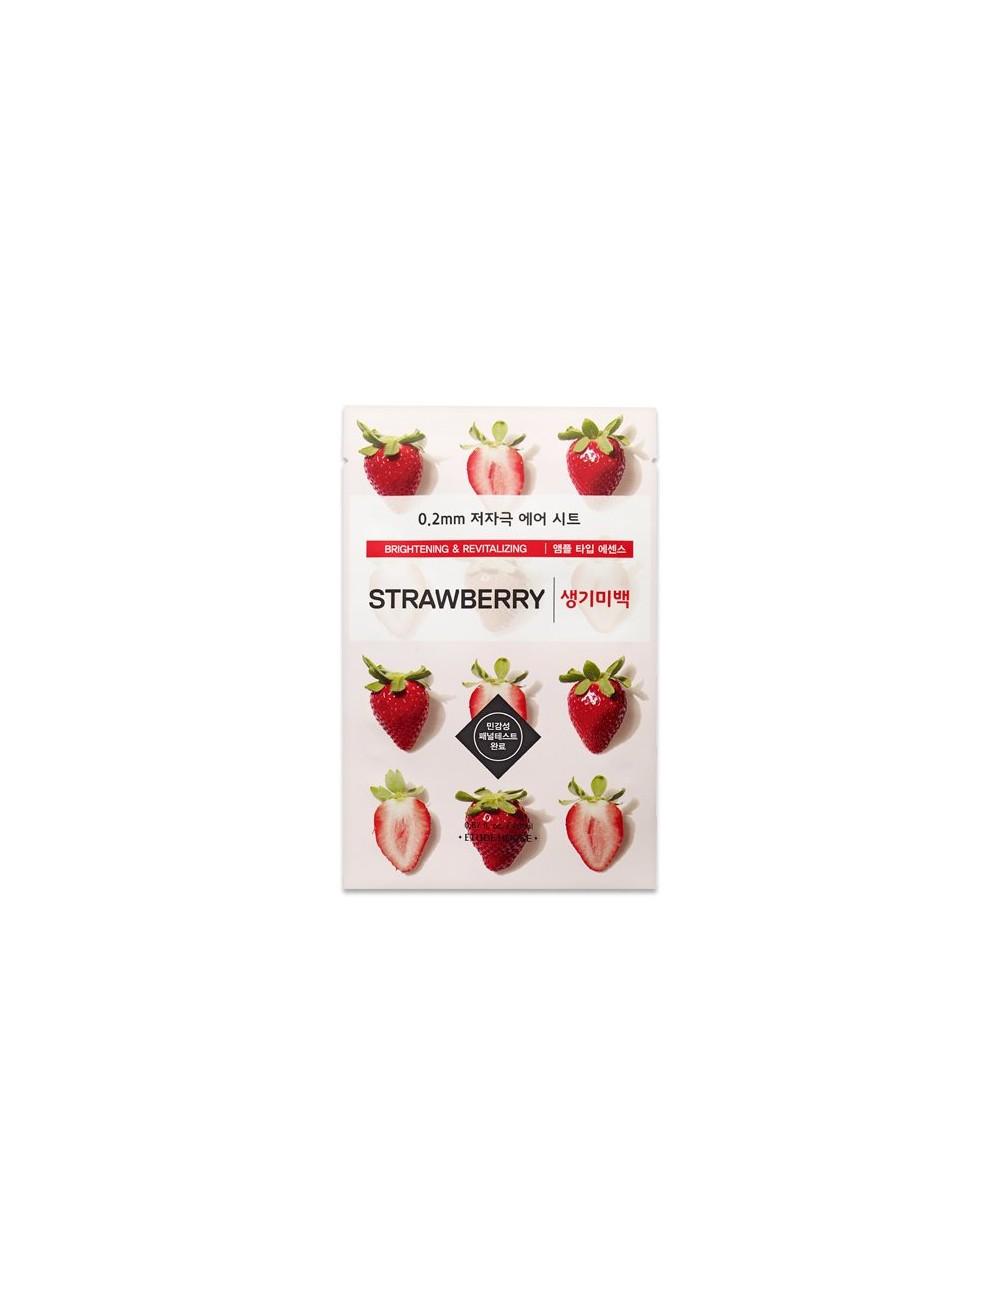 Mascarilla Iluminadora y Antimanchas Etude House 0.2 Therapy Air Mask Strawberry